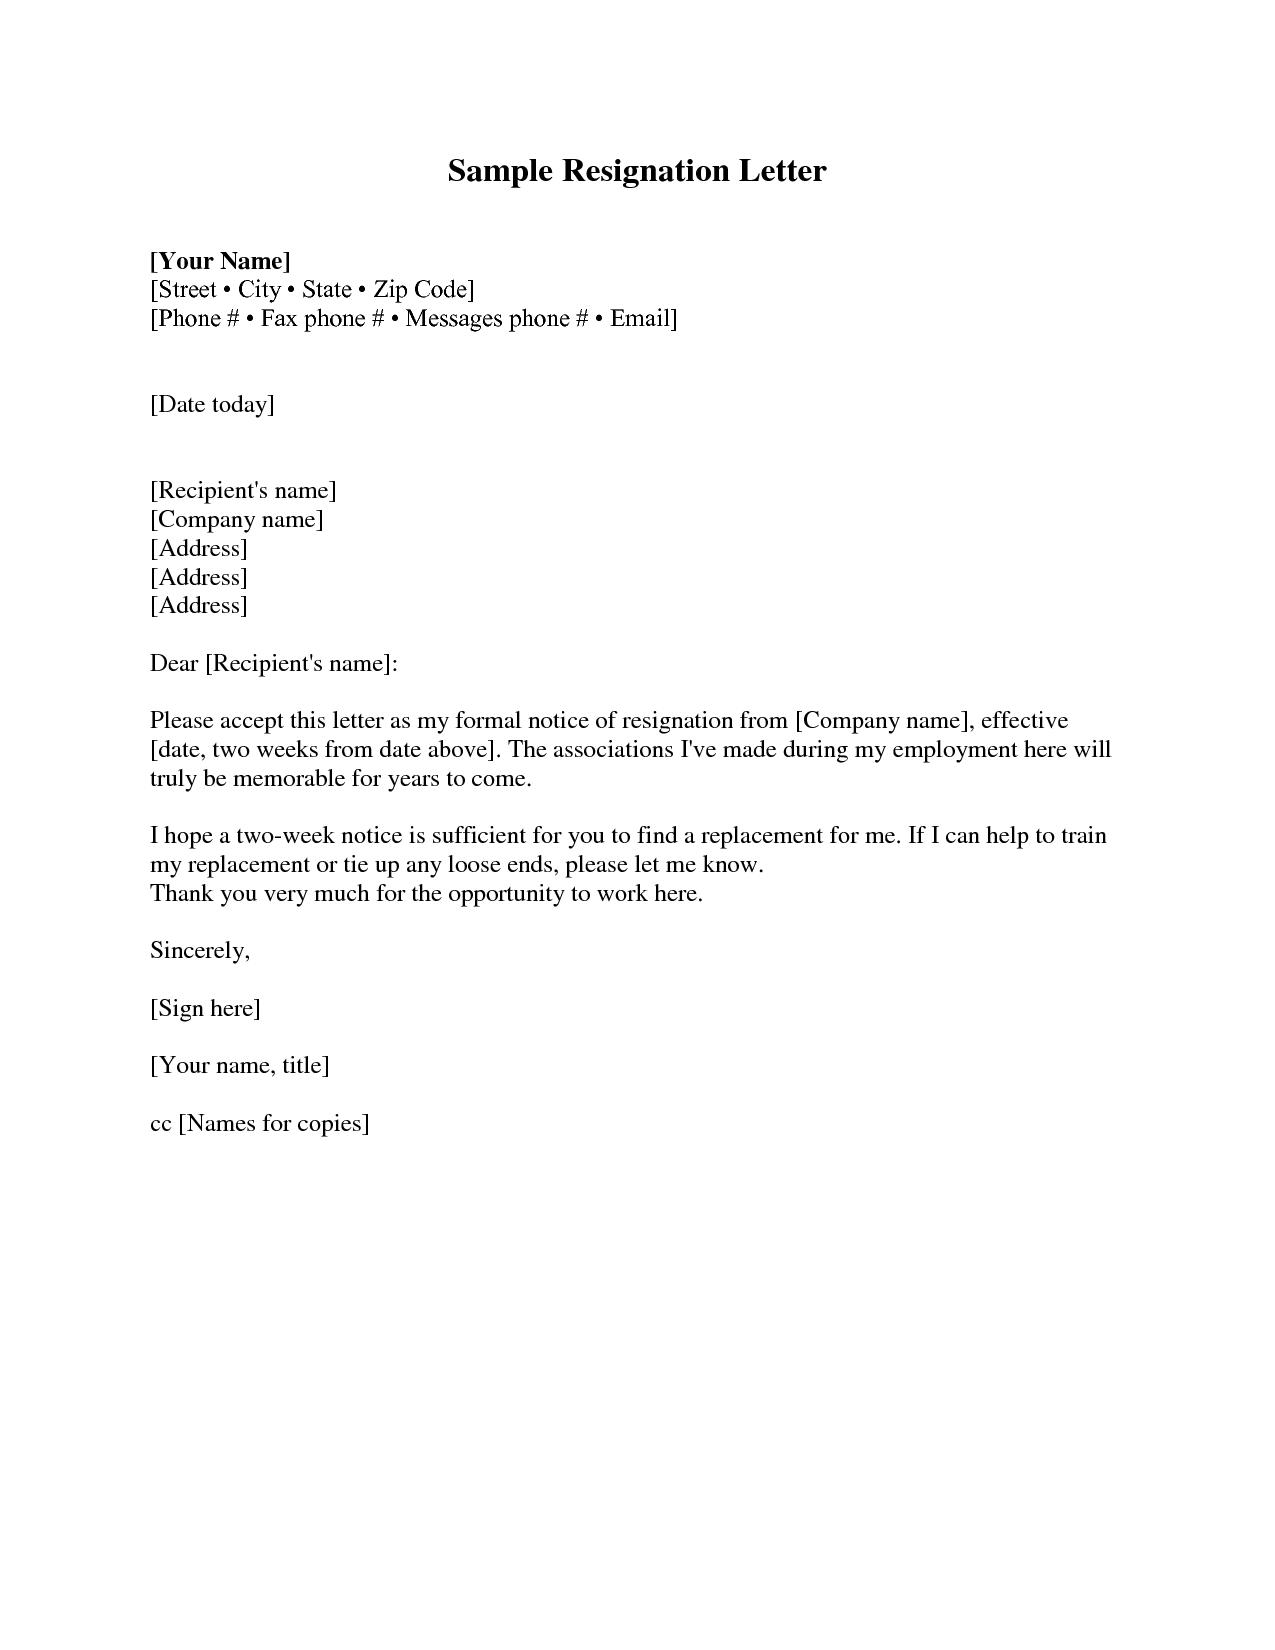 Resignation Letter 2 Weeks Notice Resignation Letter